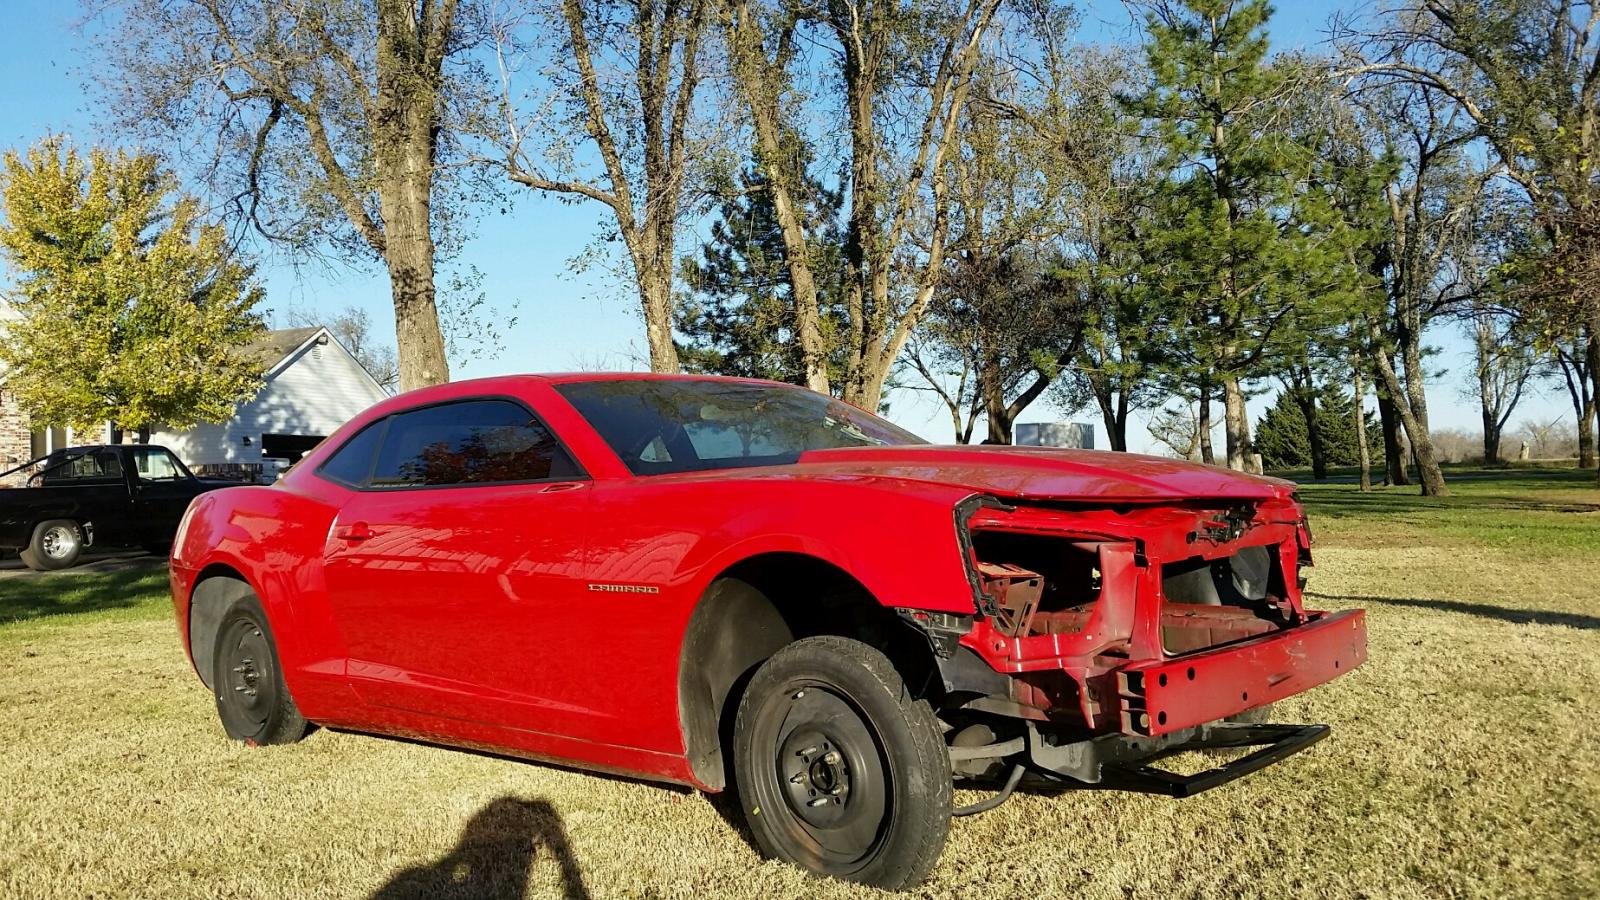 5Th Gen Camaro For Sale >> 2010 Ss Camaro Roller Or Body Only Camaro5 Chevy Camaro